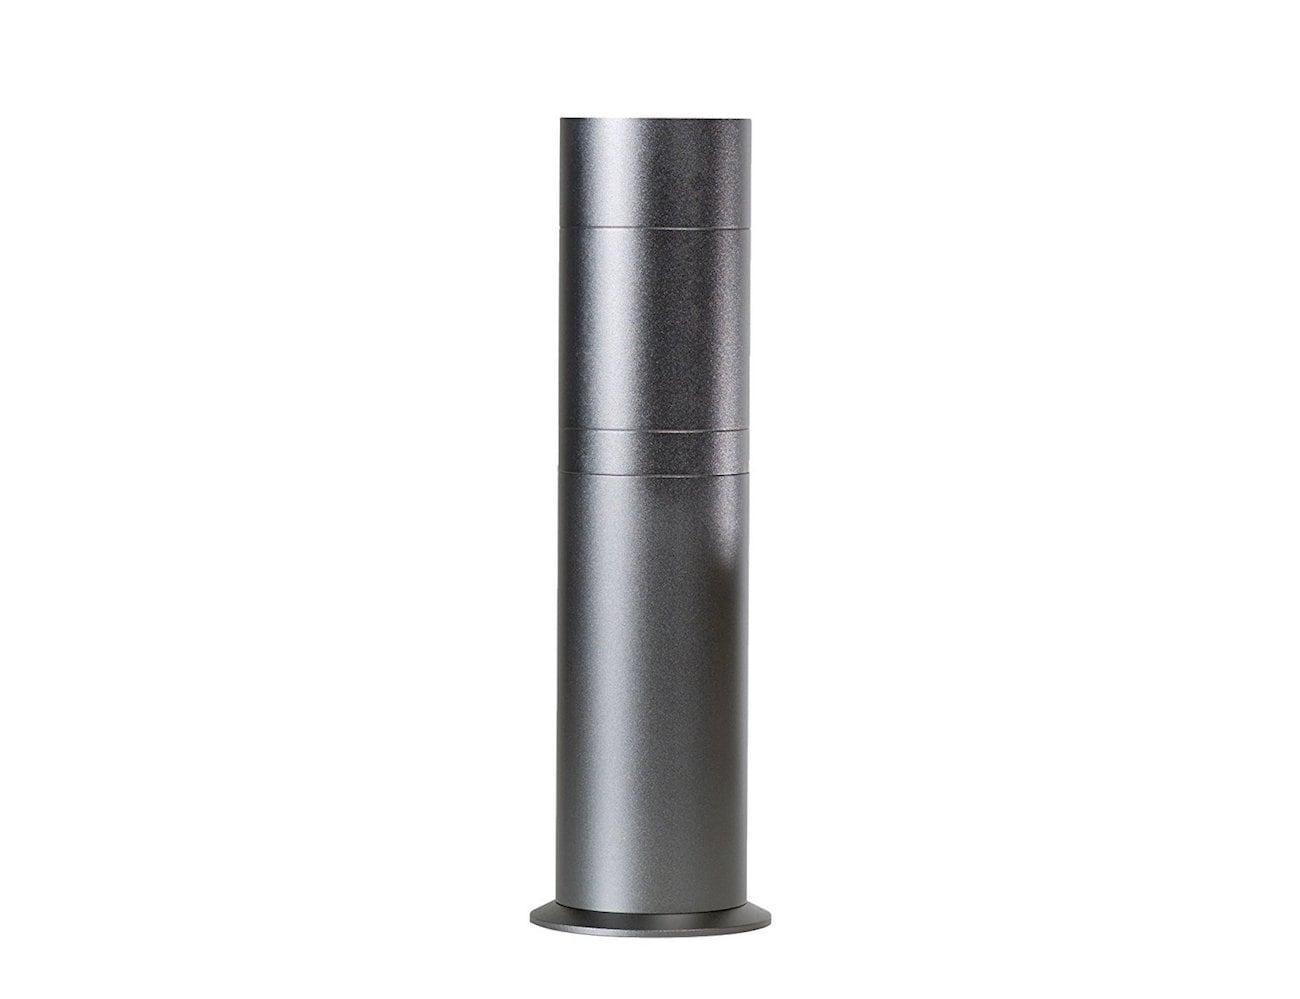 AroMini Essential Oil Fragrance Diffuser